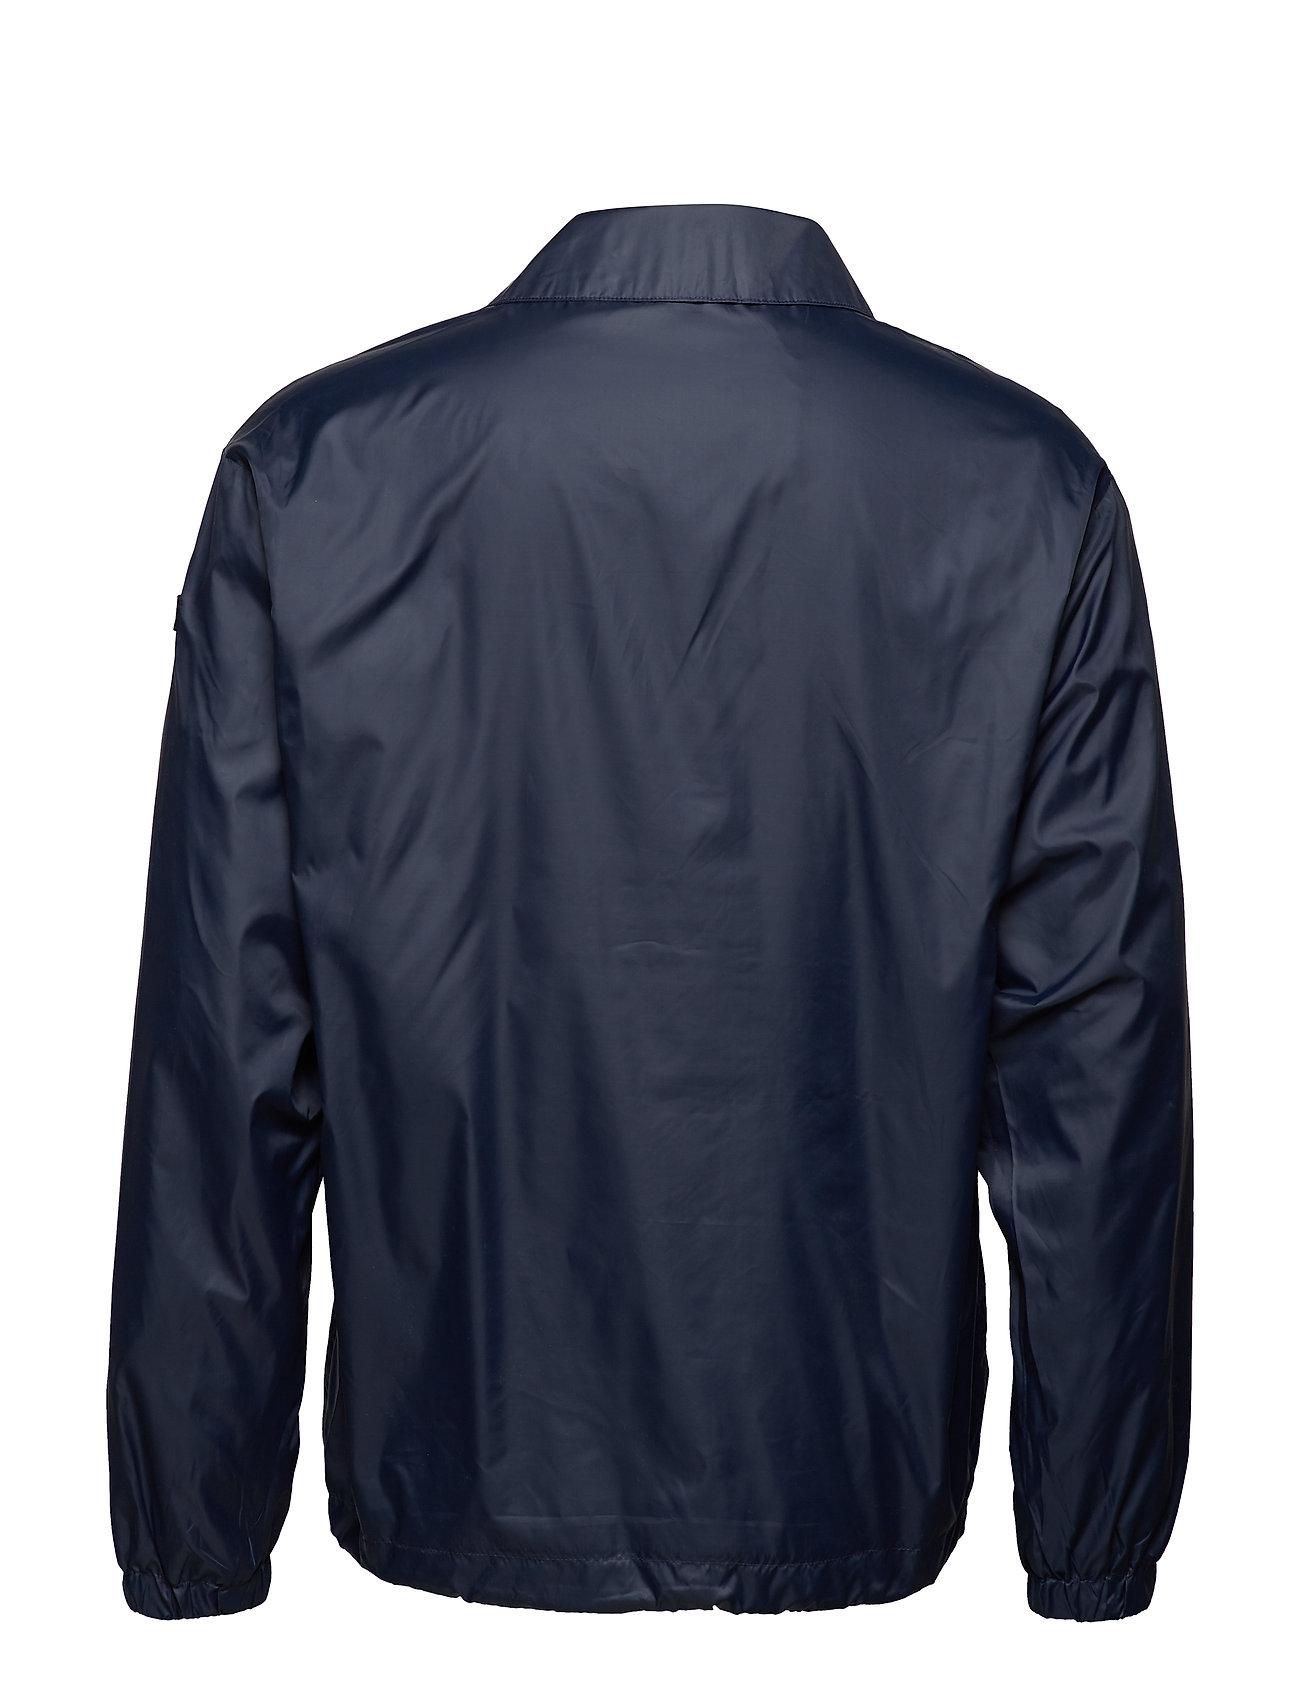 IrisTommy Solid Jeans Jacketblack Tjm Coach WQerxBCod